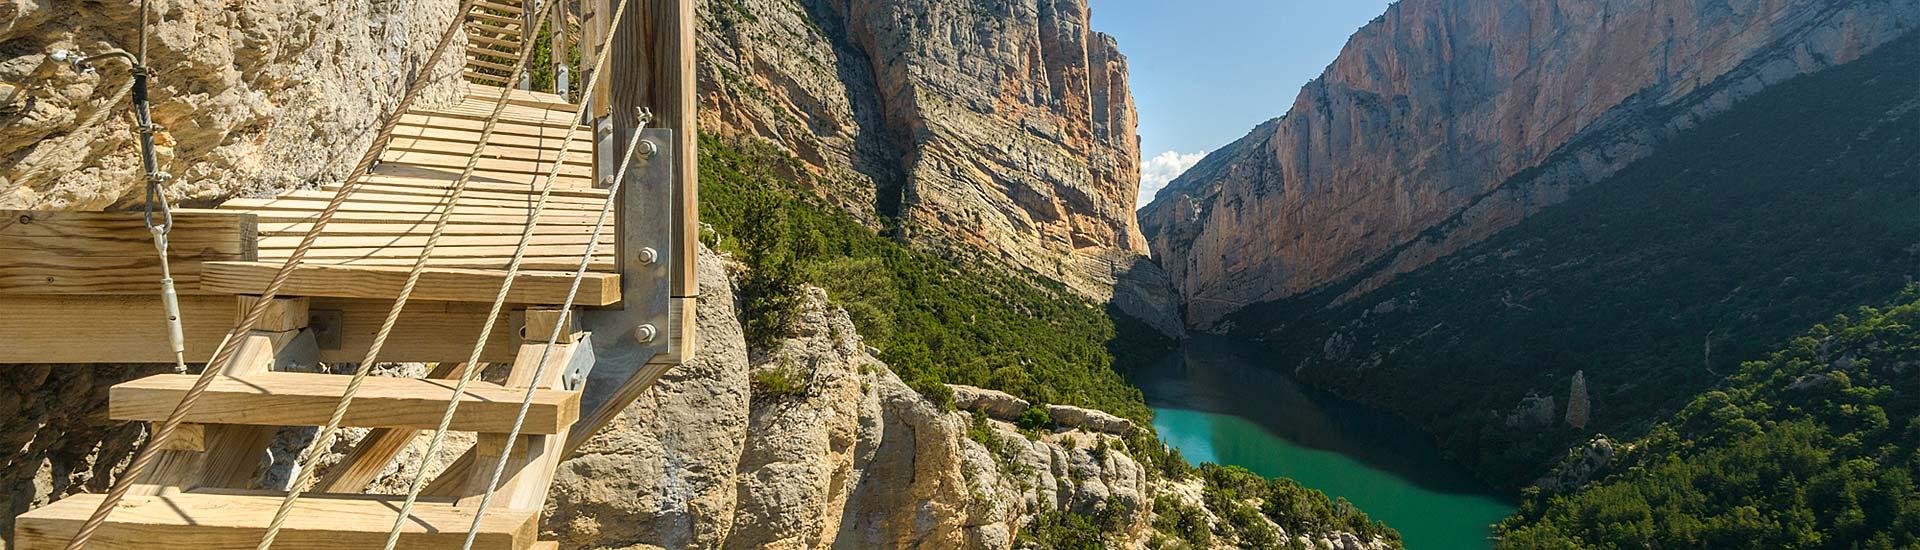 turismo activo montsec